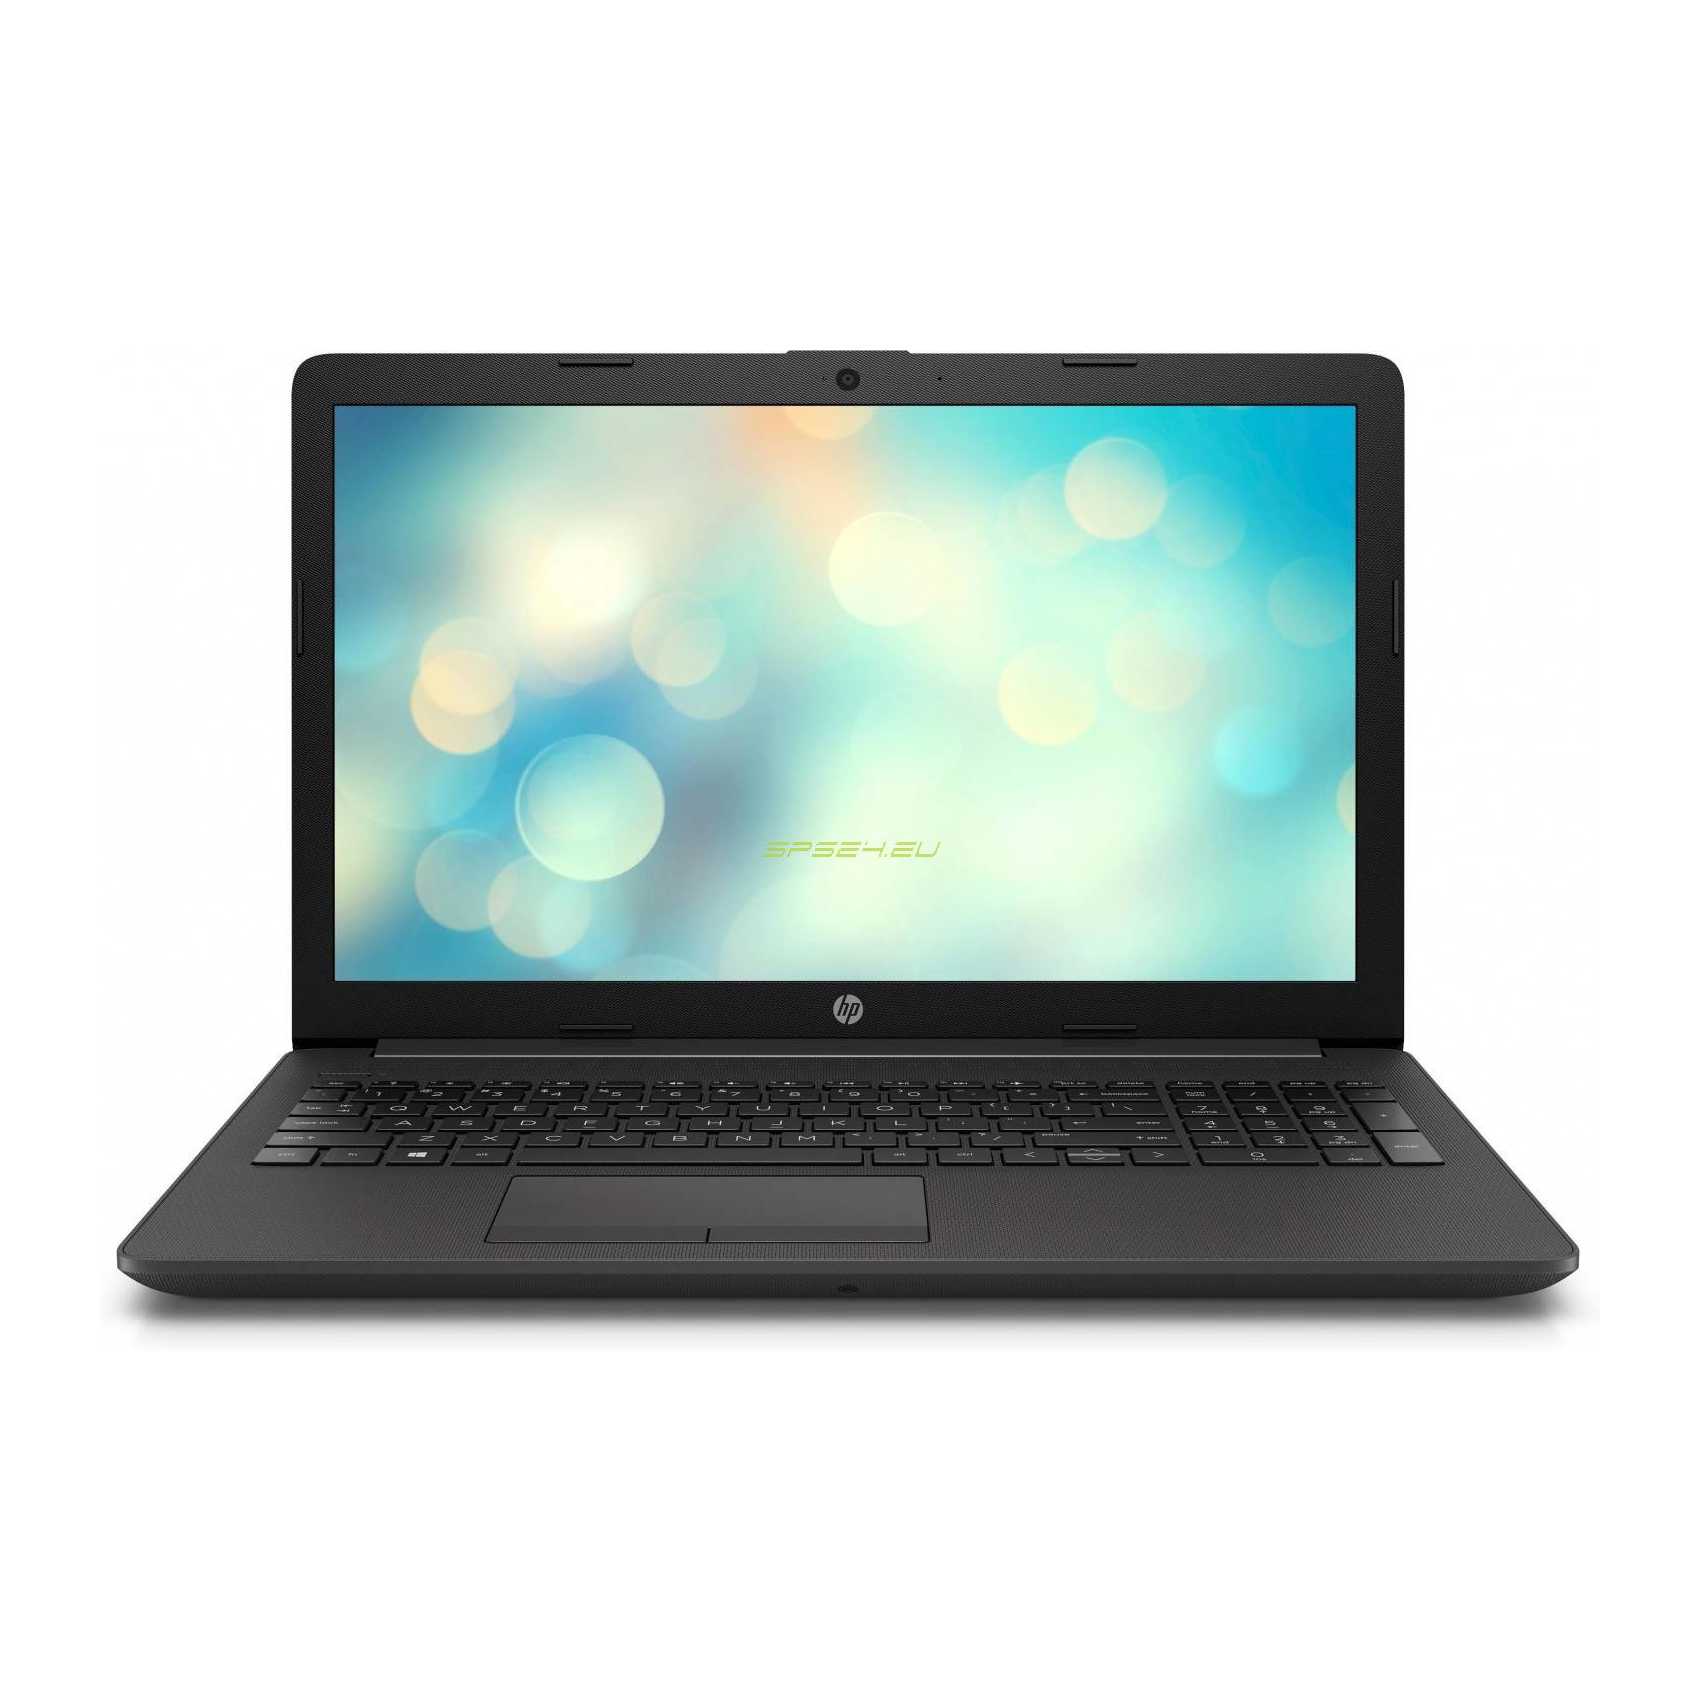 NOTEBOOK HP 255 G7 AMD RYZEN R5-3500U 2.10GHz UP TO 3.7GHz 4M 8G 1T AMD RADEON VEGA 8 15.6 BLACK ,Laptop Pc